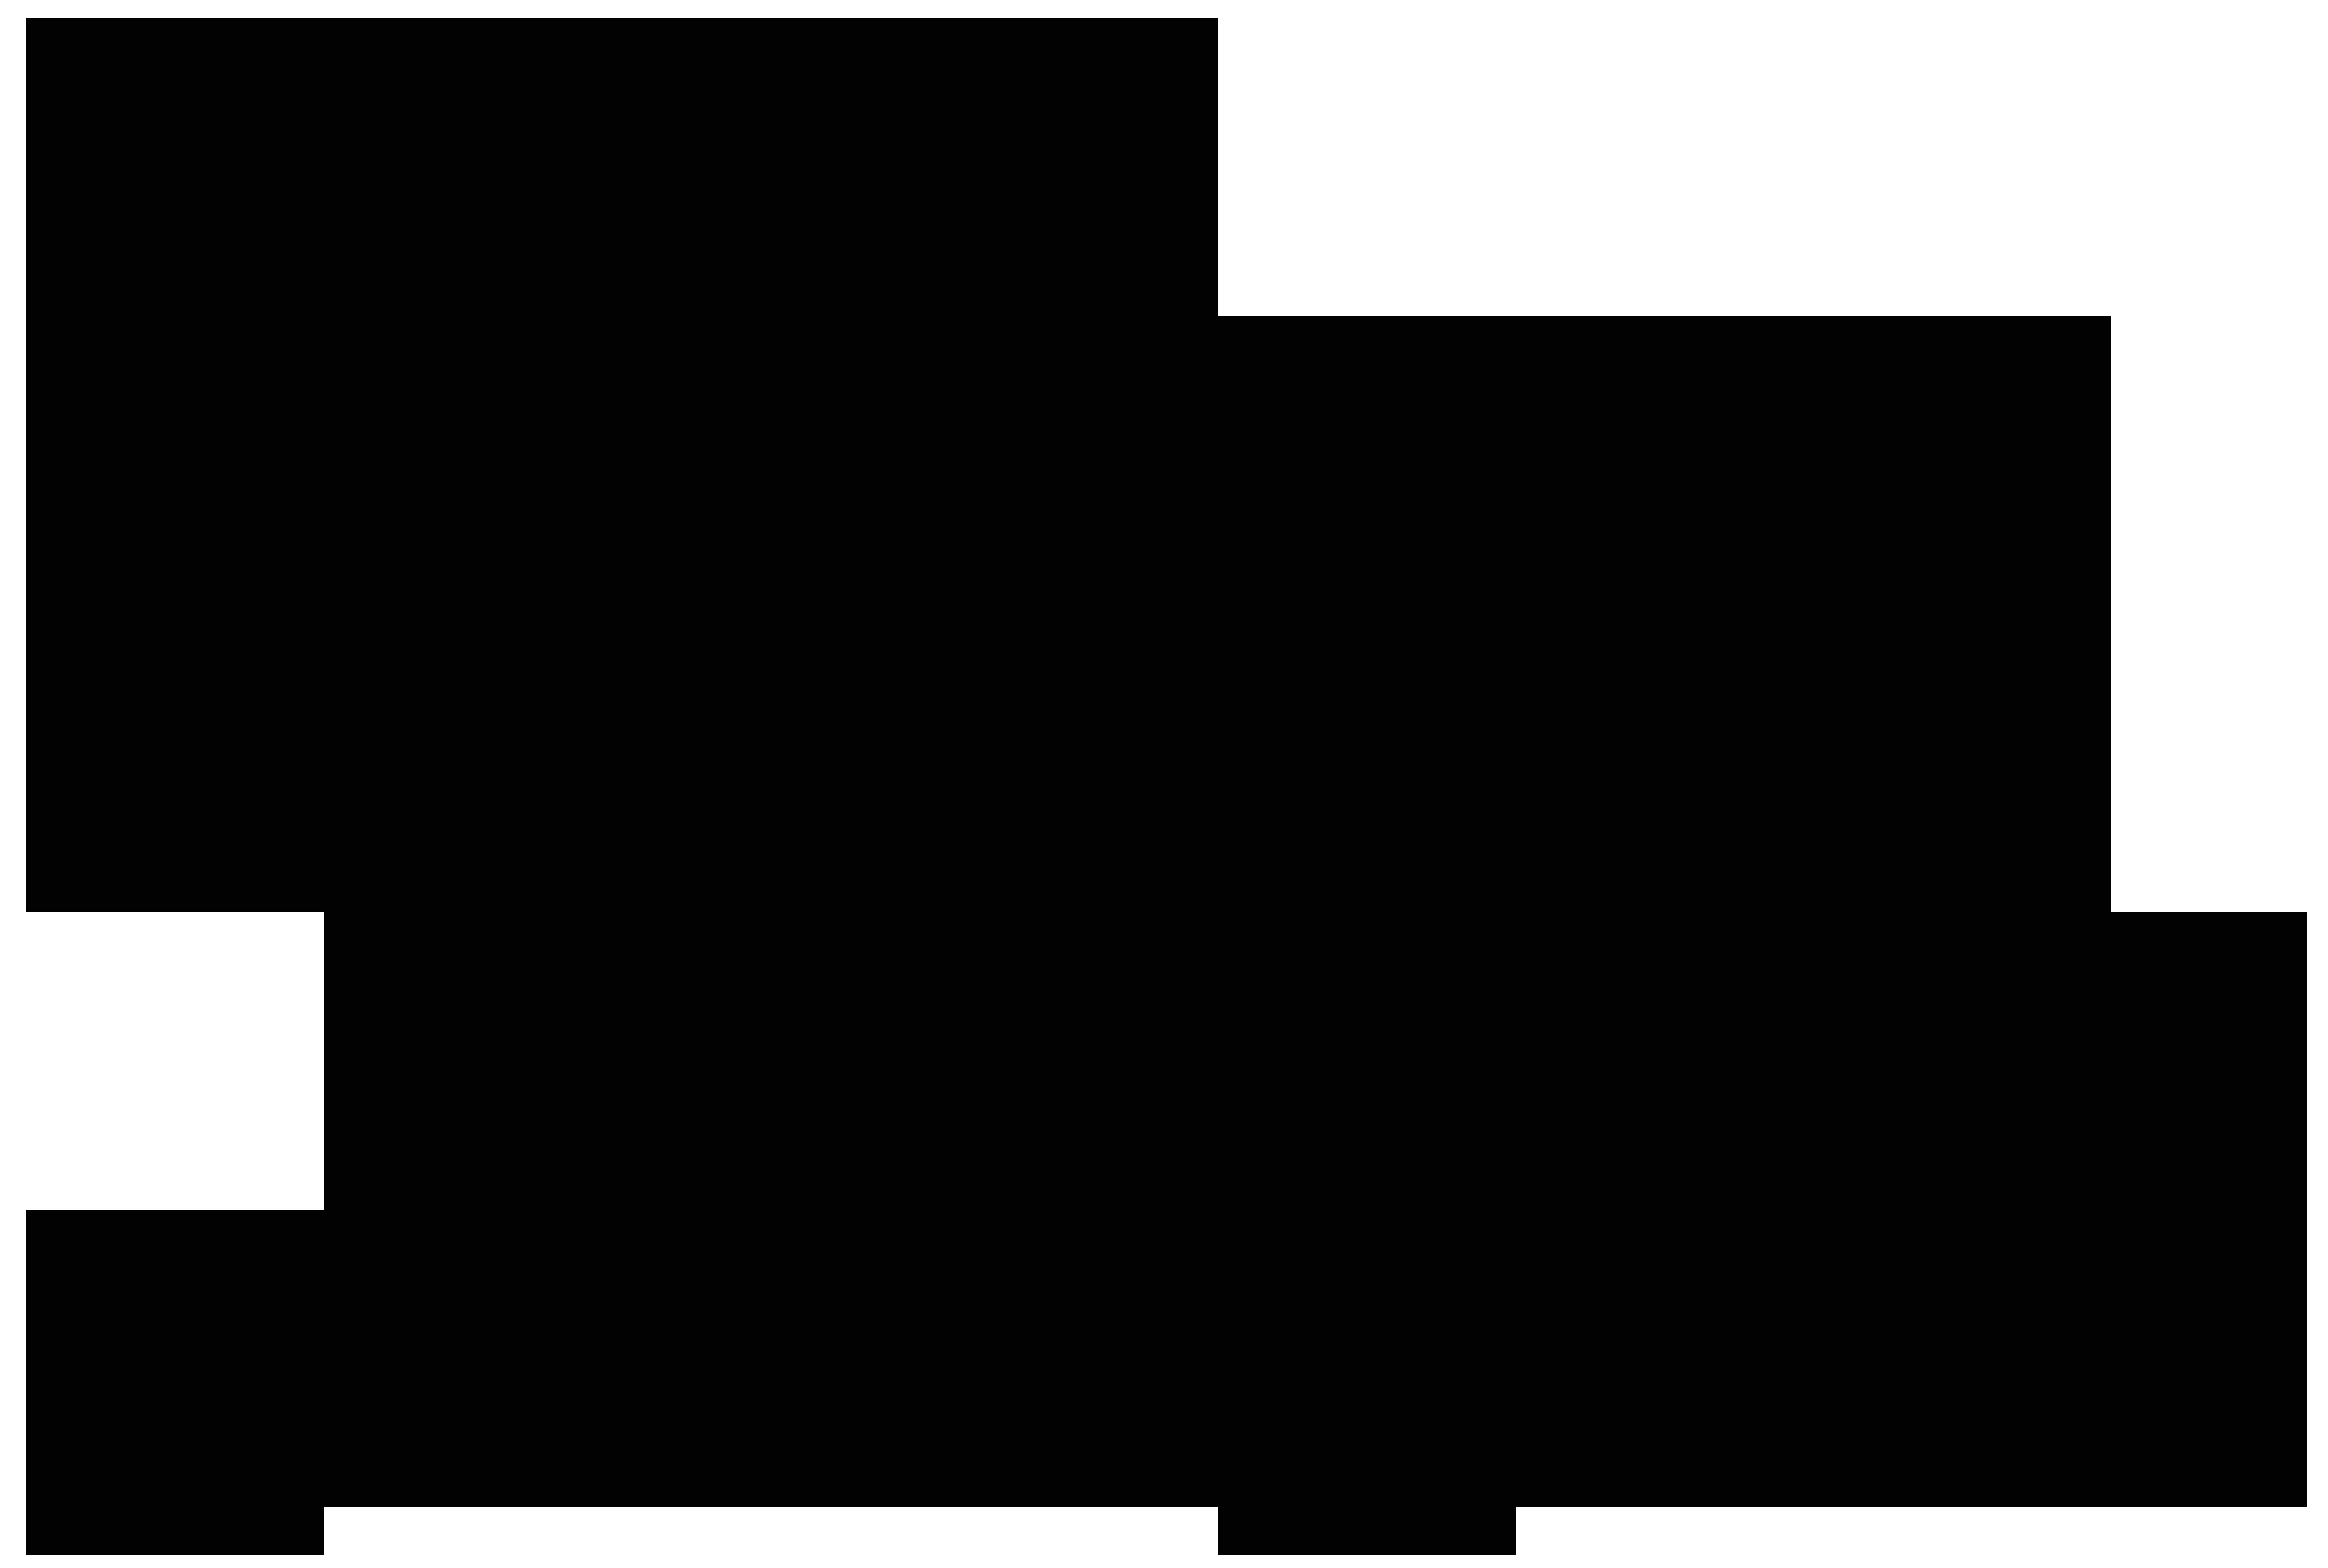 Running Horse Silhouette Clip Art Image.